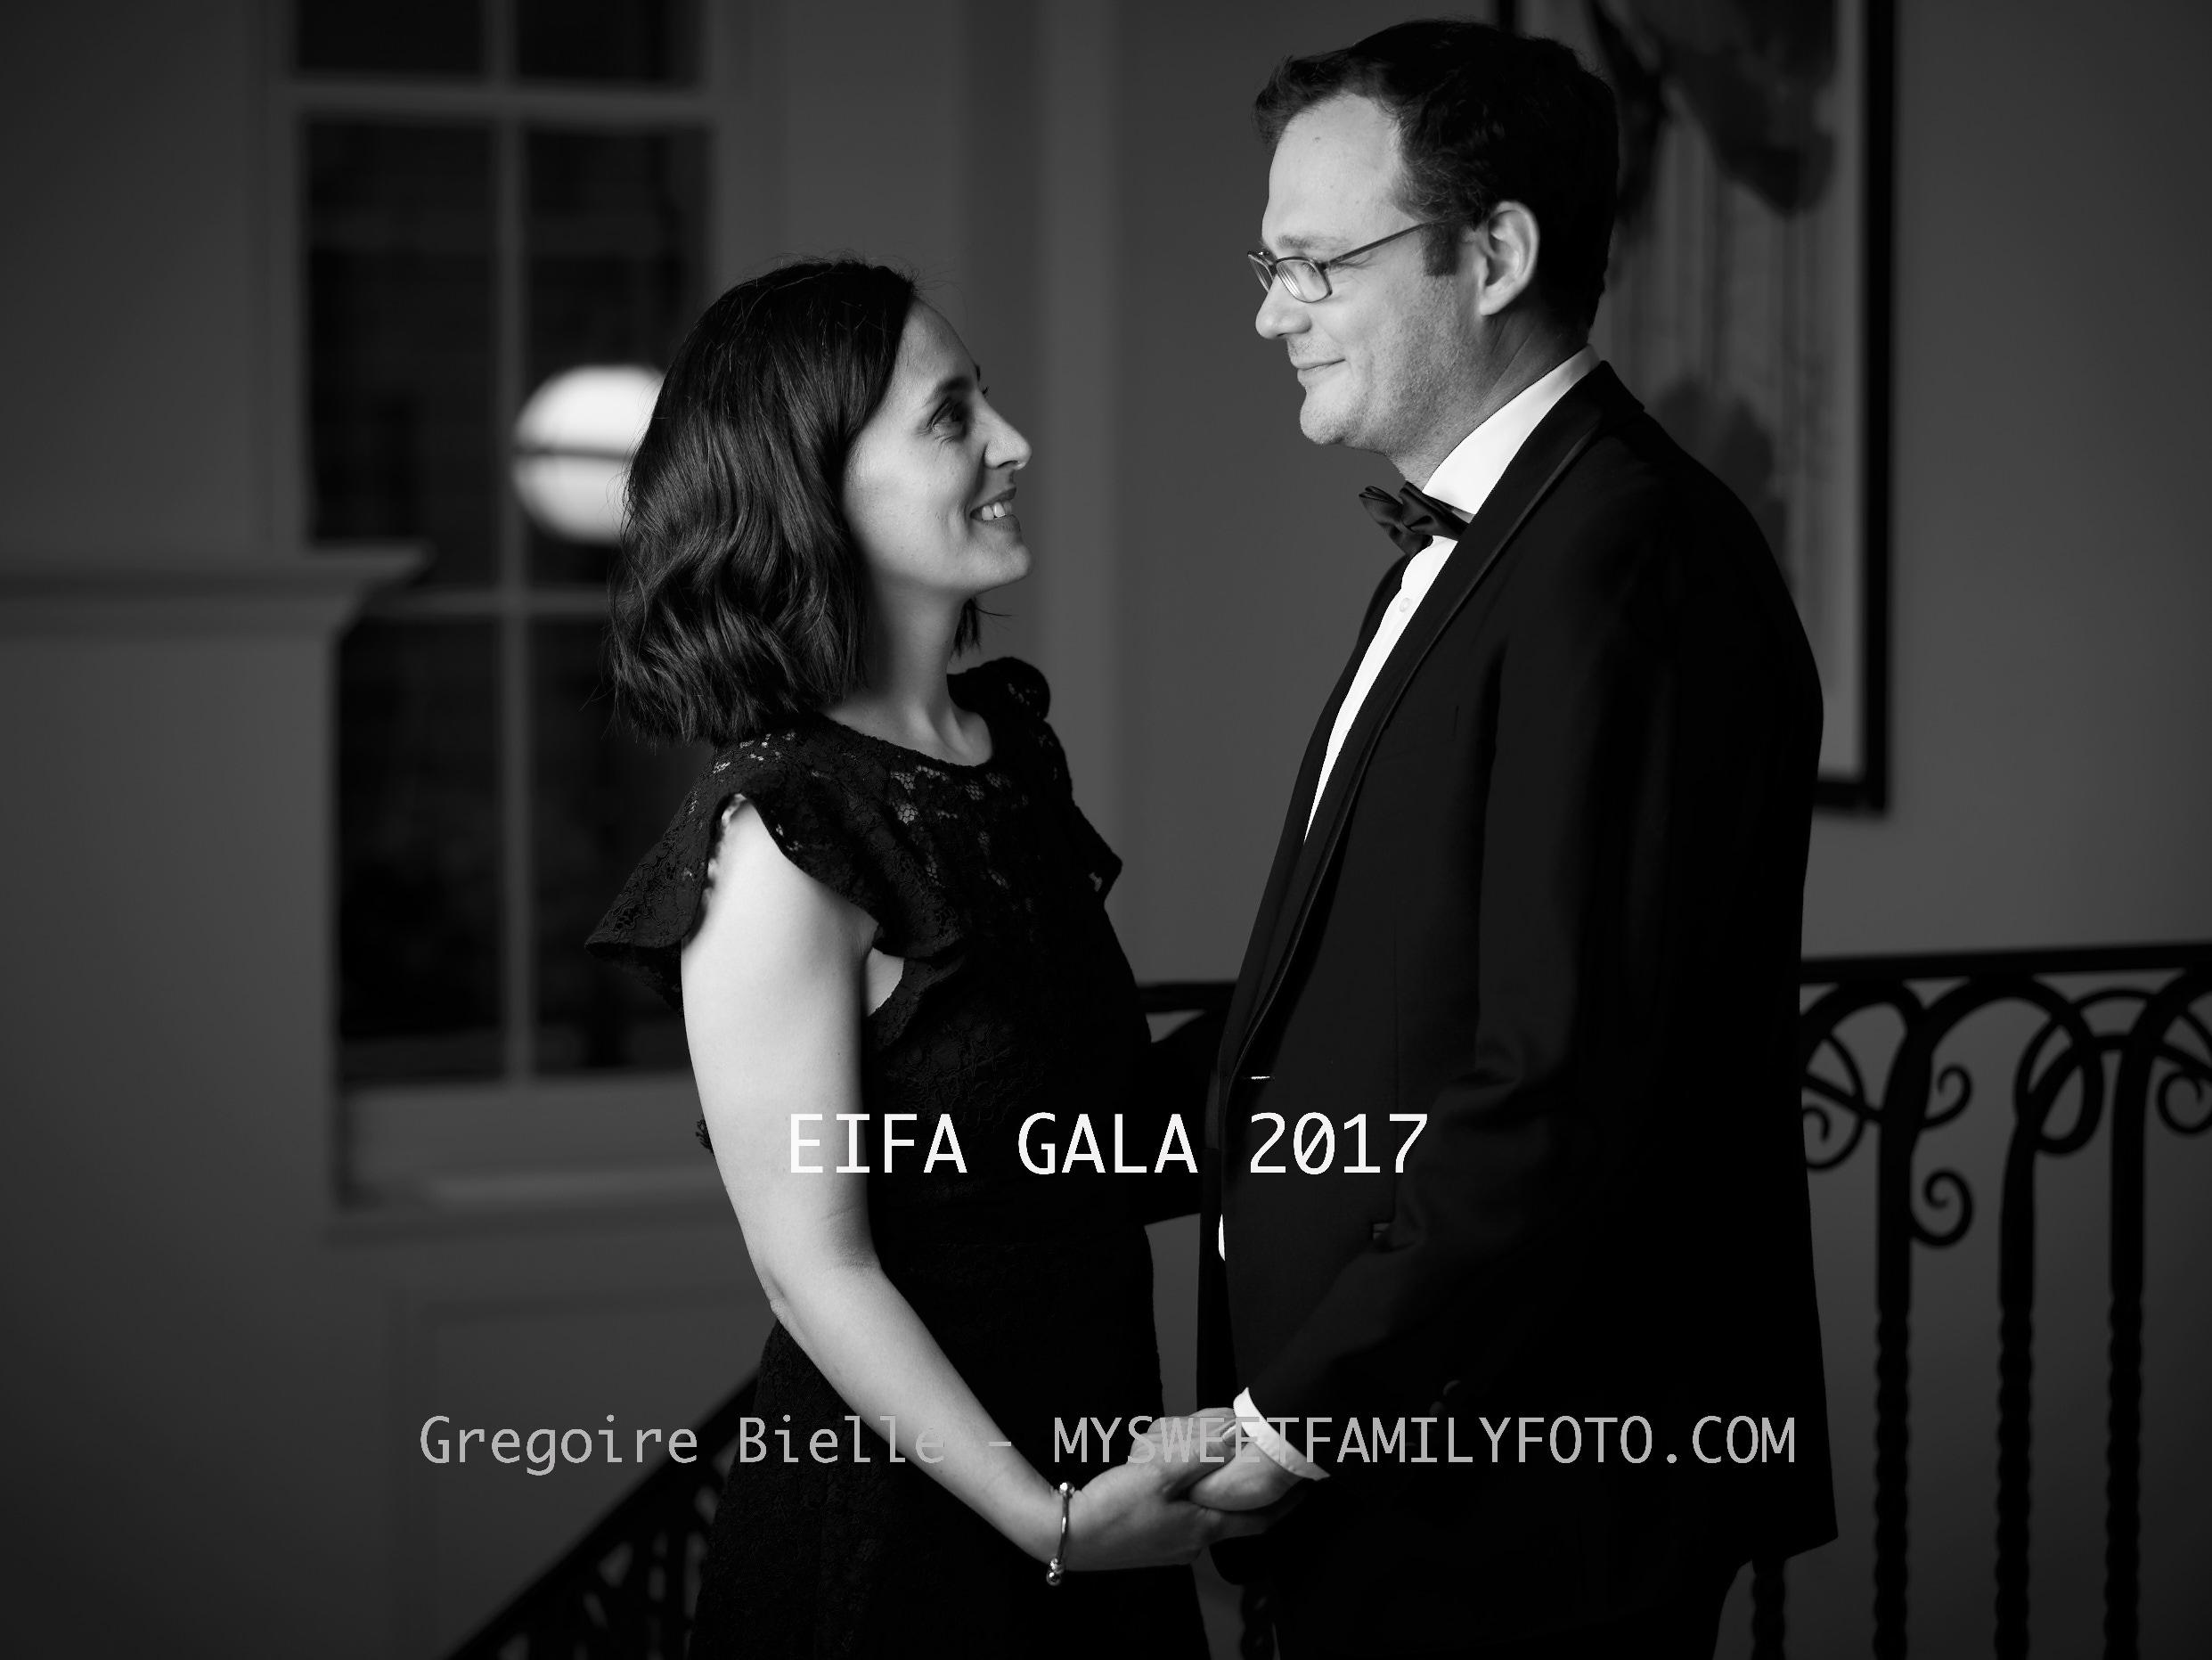 EIFA GALA 1132.jpg